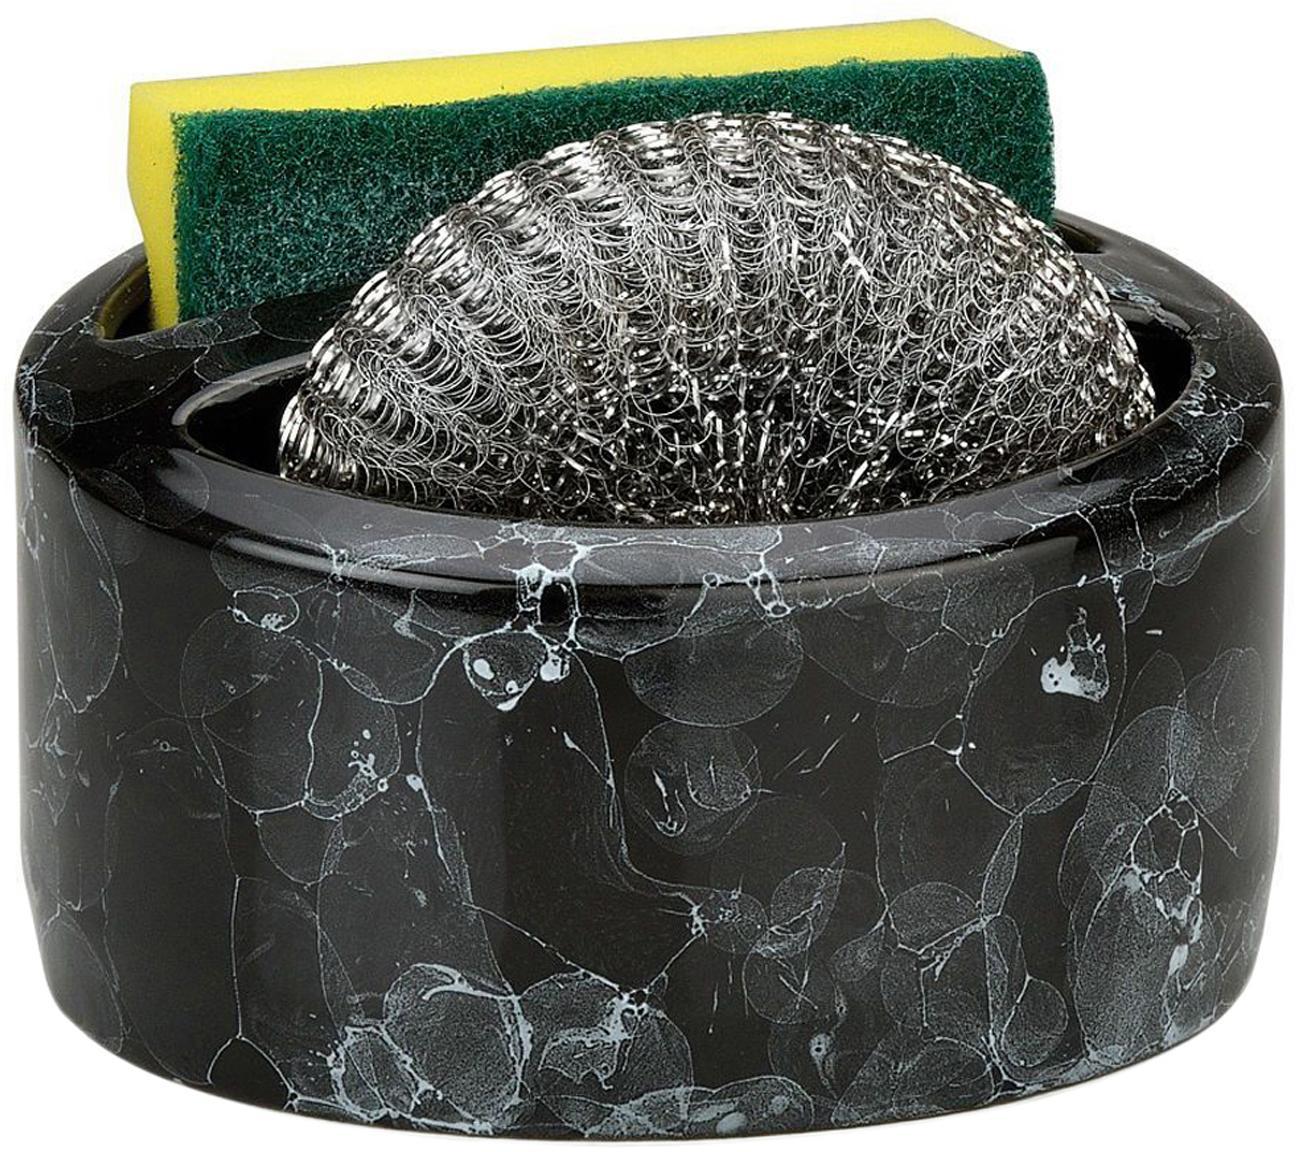 Schwammhalter Bubble in Marmor-Optik, 3er-Set, Schwarz, marmoriert, Ø 14 x H 11 cm